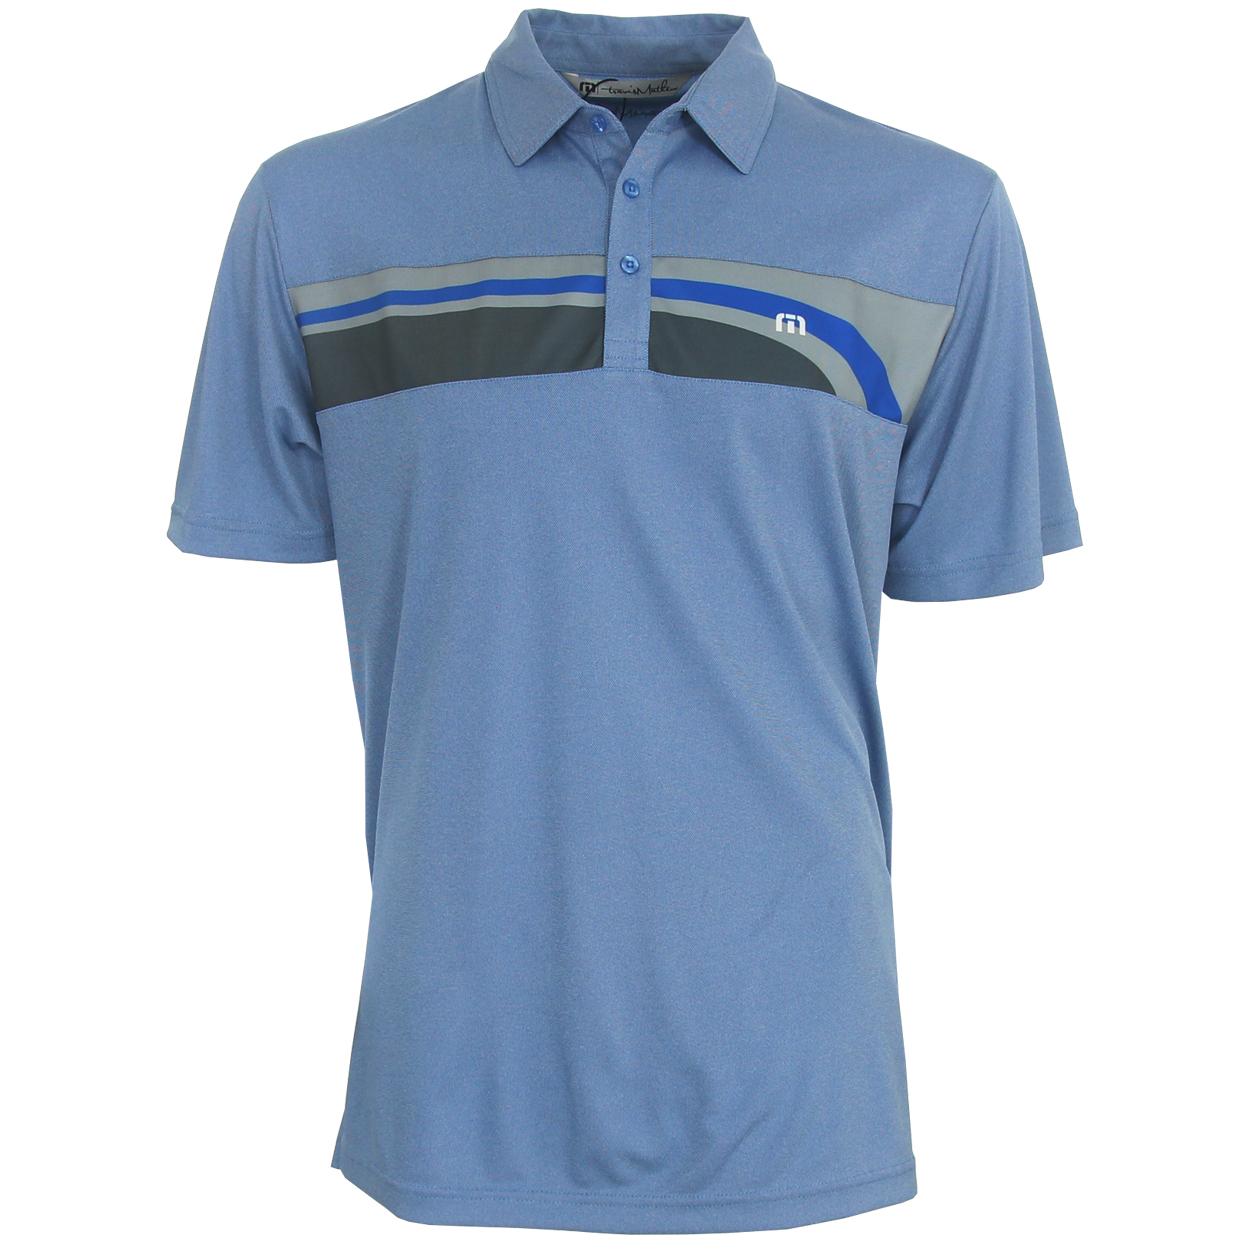 Travis mathew short par 4 polo golf shirt brand new ebay for Polo brand polo shirts